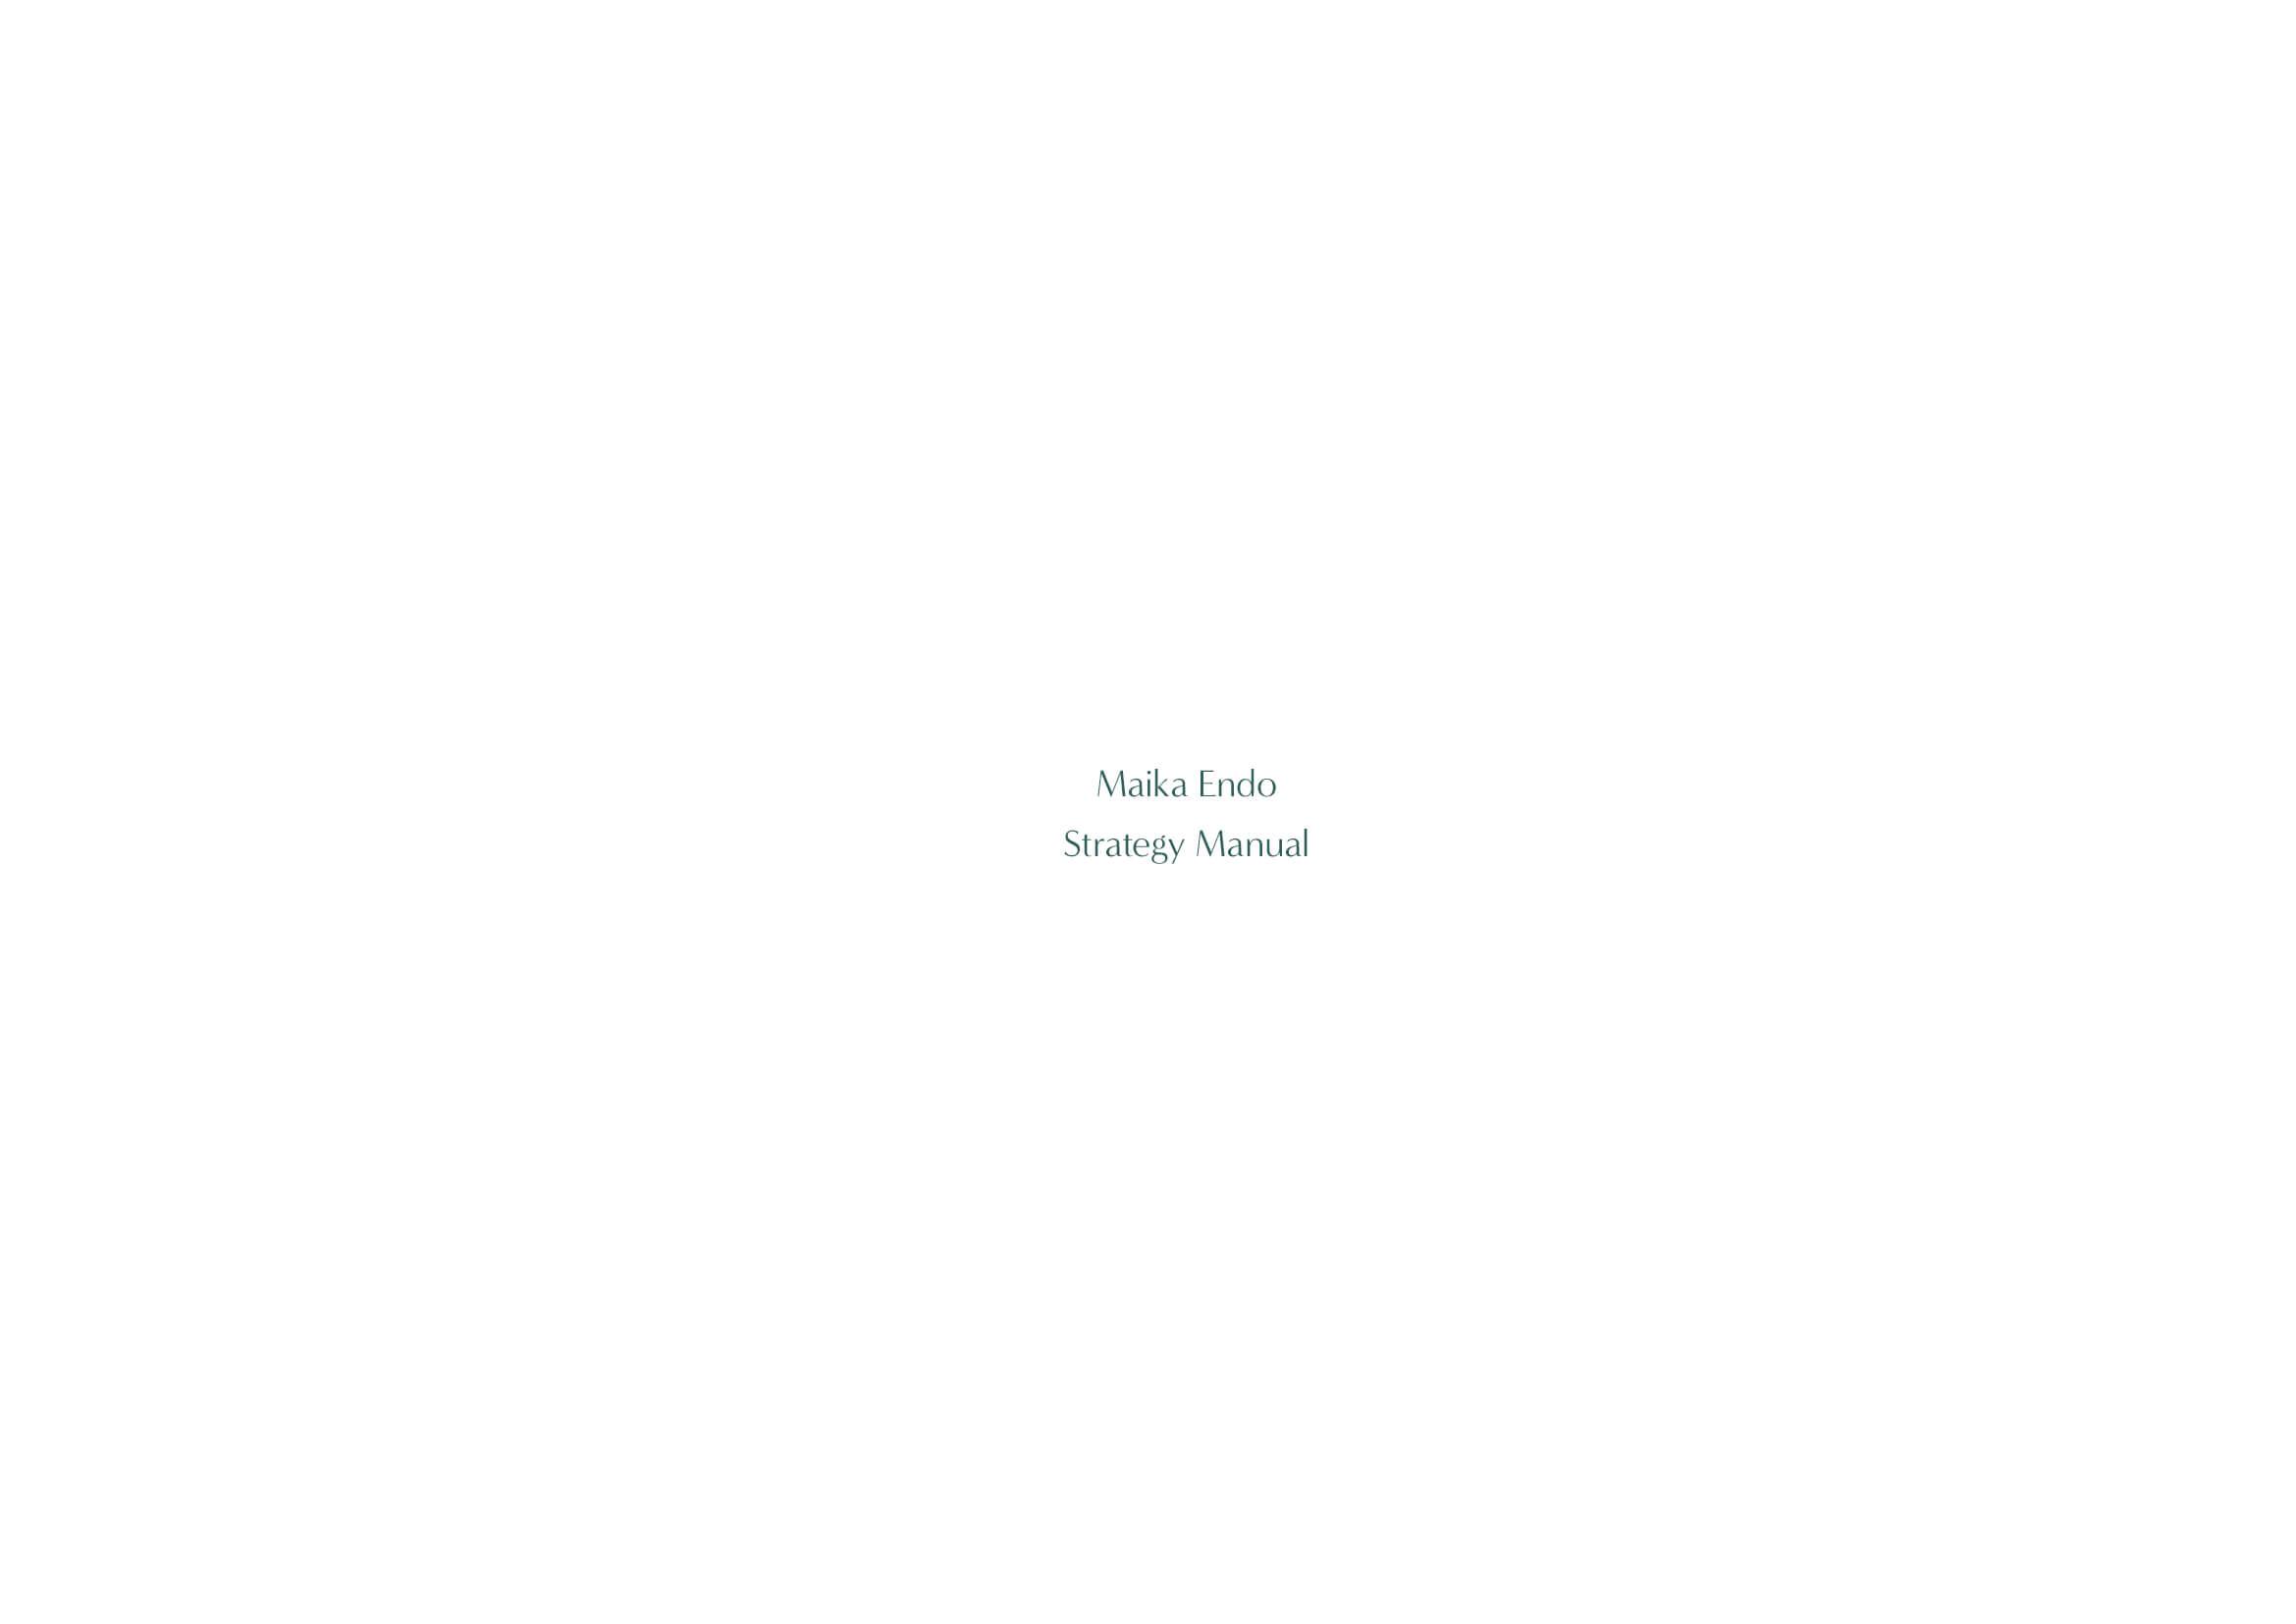 Maika Endo Strategy Manual.jpg